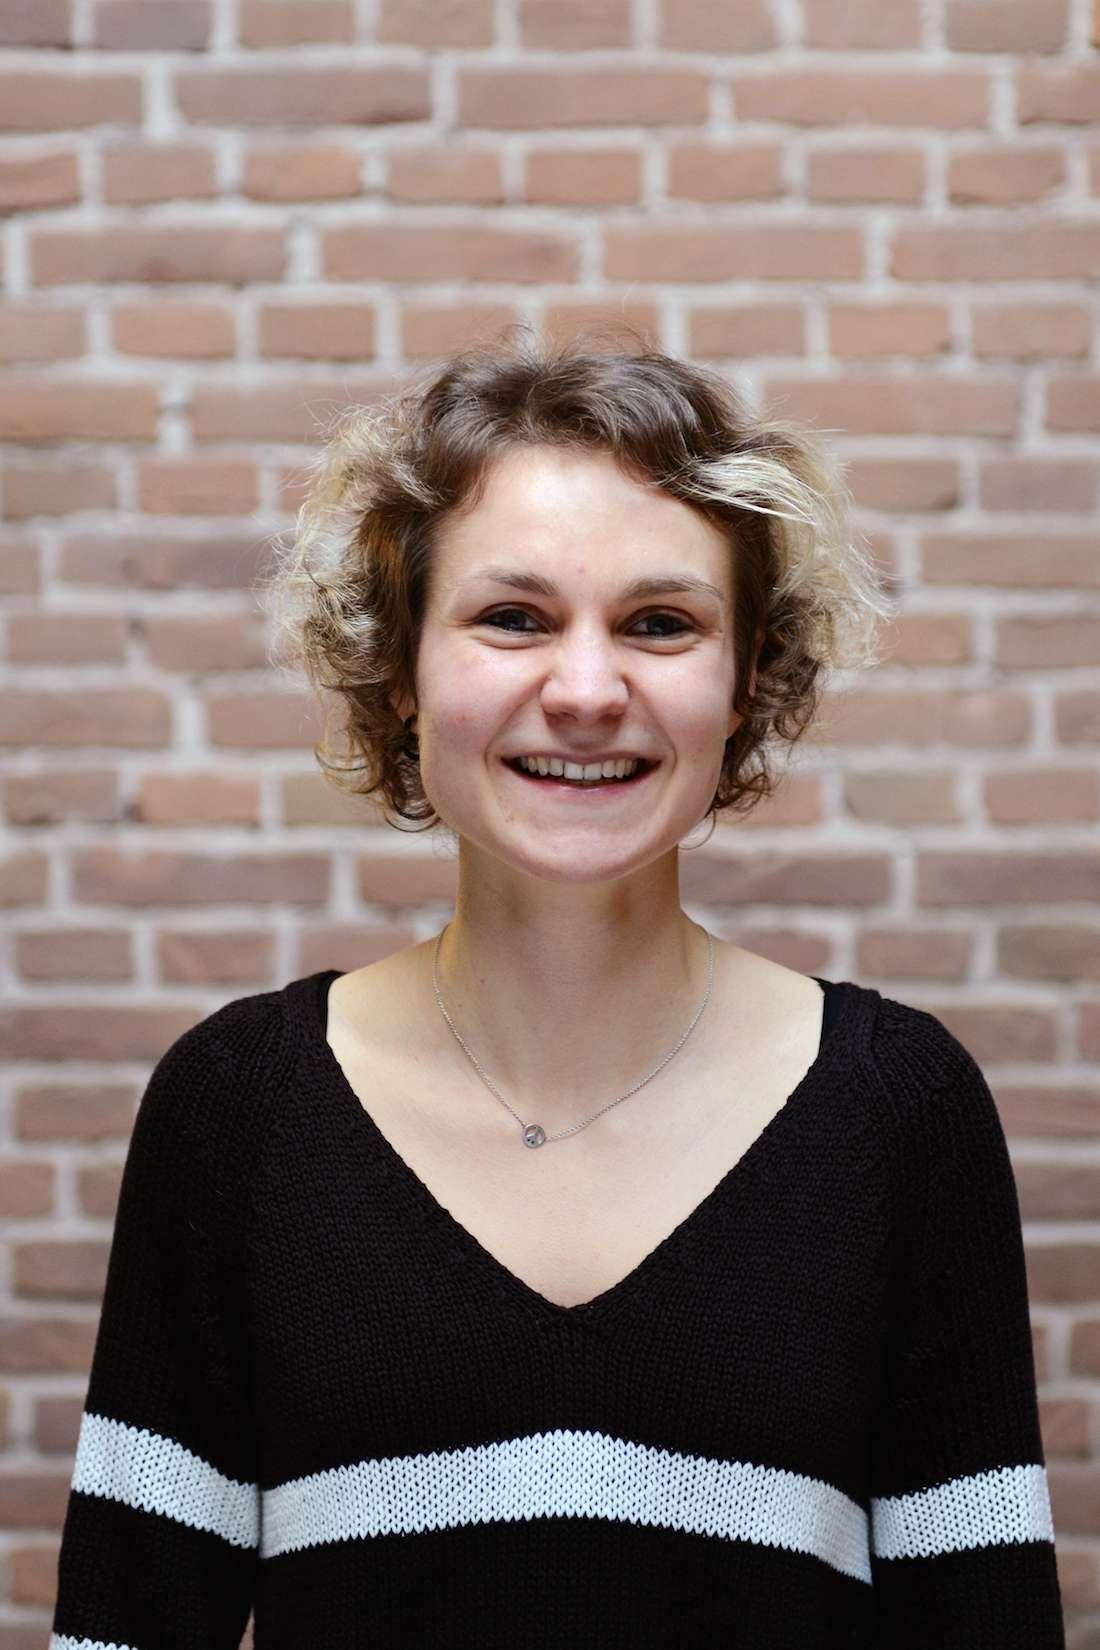 Emma Jense